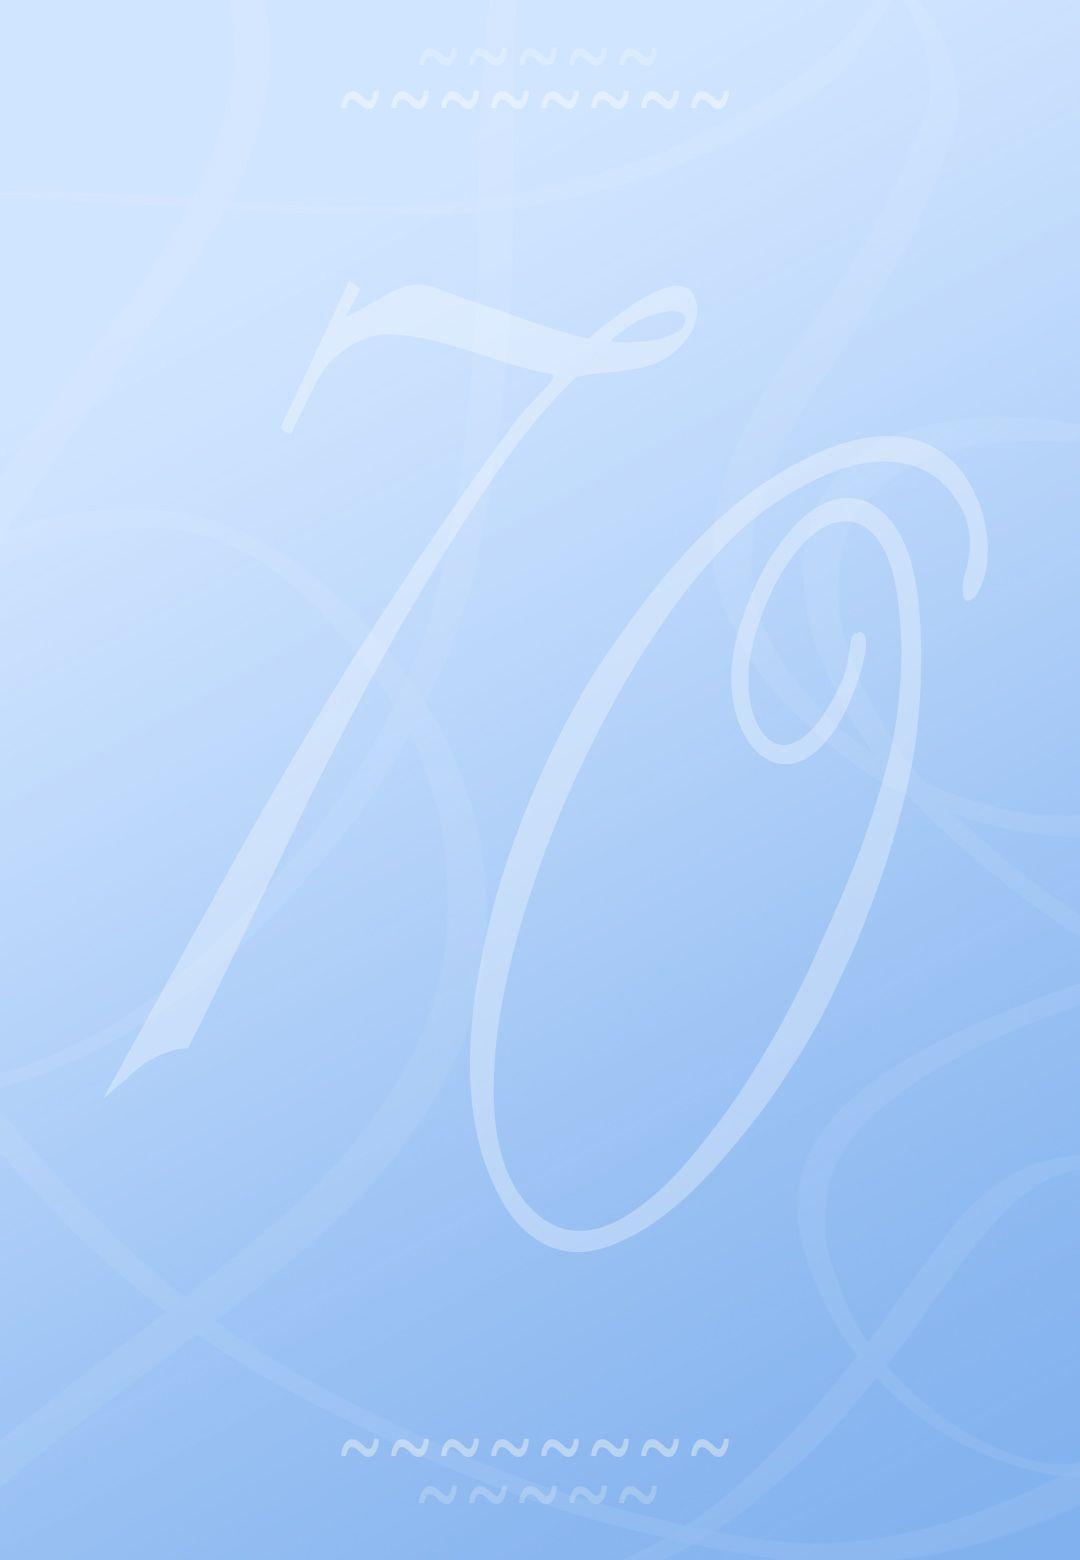 Free Printable 70Th Birthday Invitation | Favorite Public Art - Free Printable 70Th Birthday Party Invitations